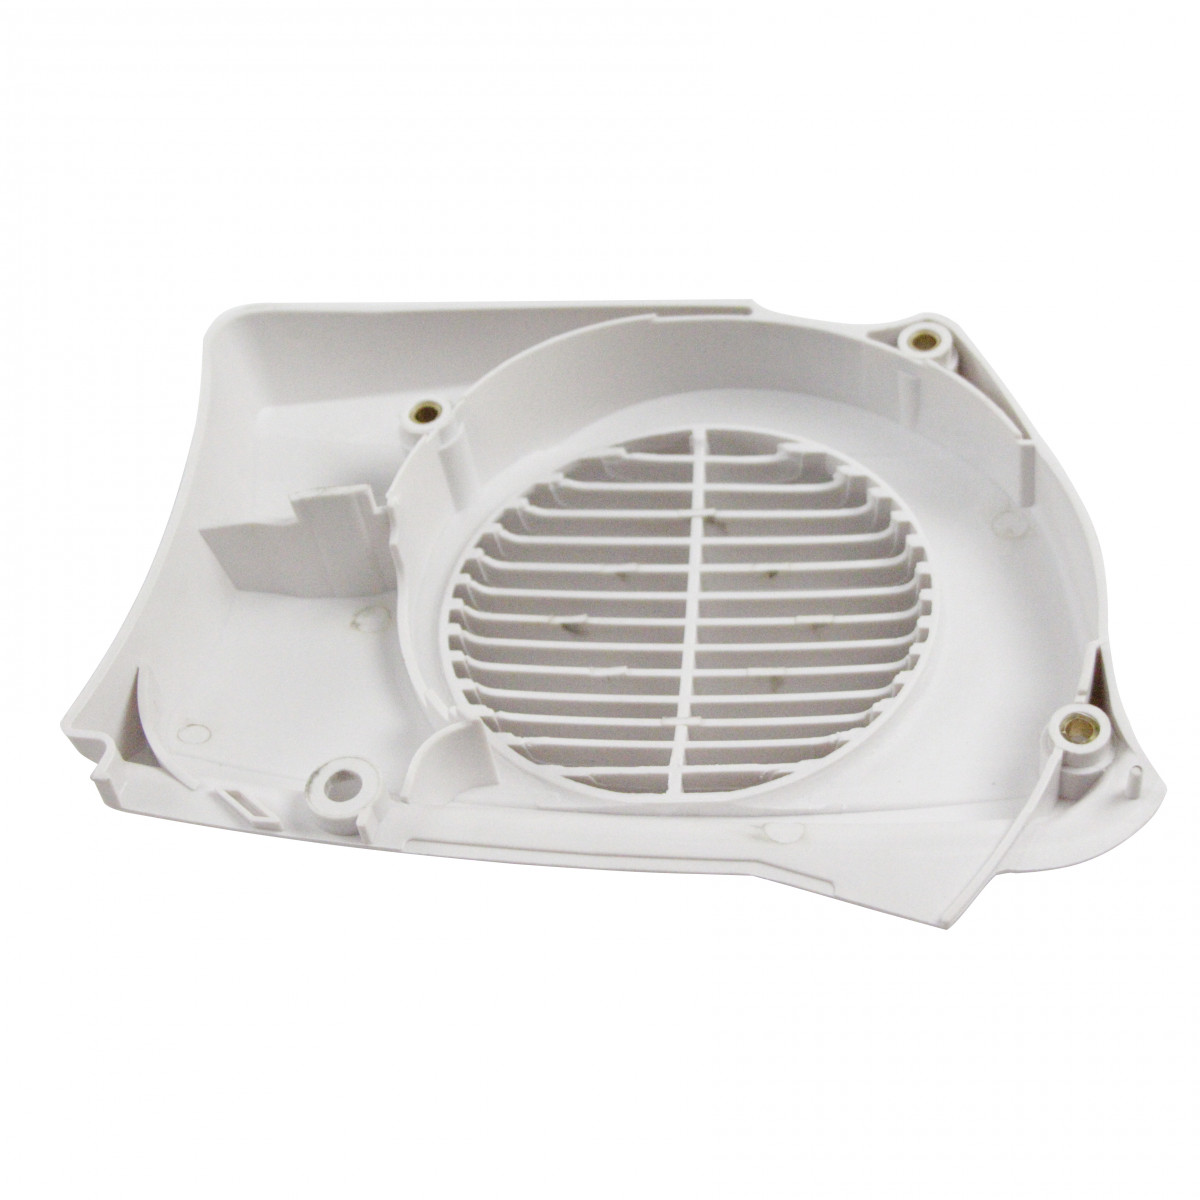 Kryt ventilátora STIHL TS410 TS420 - 4238 080 3100